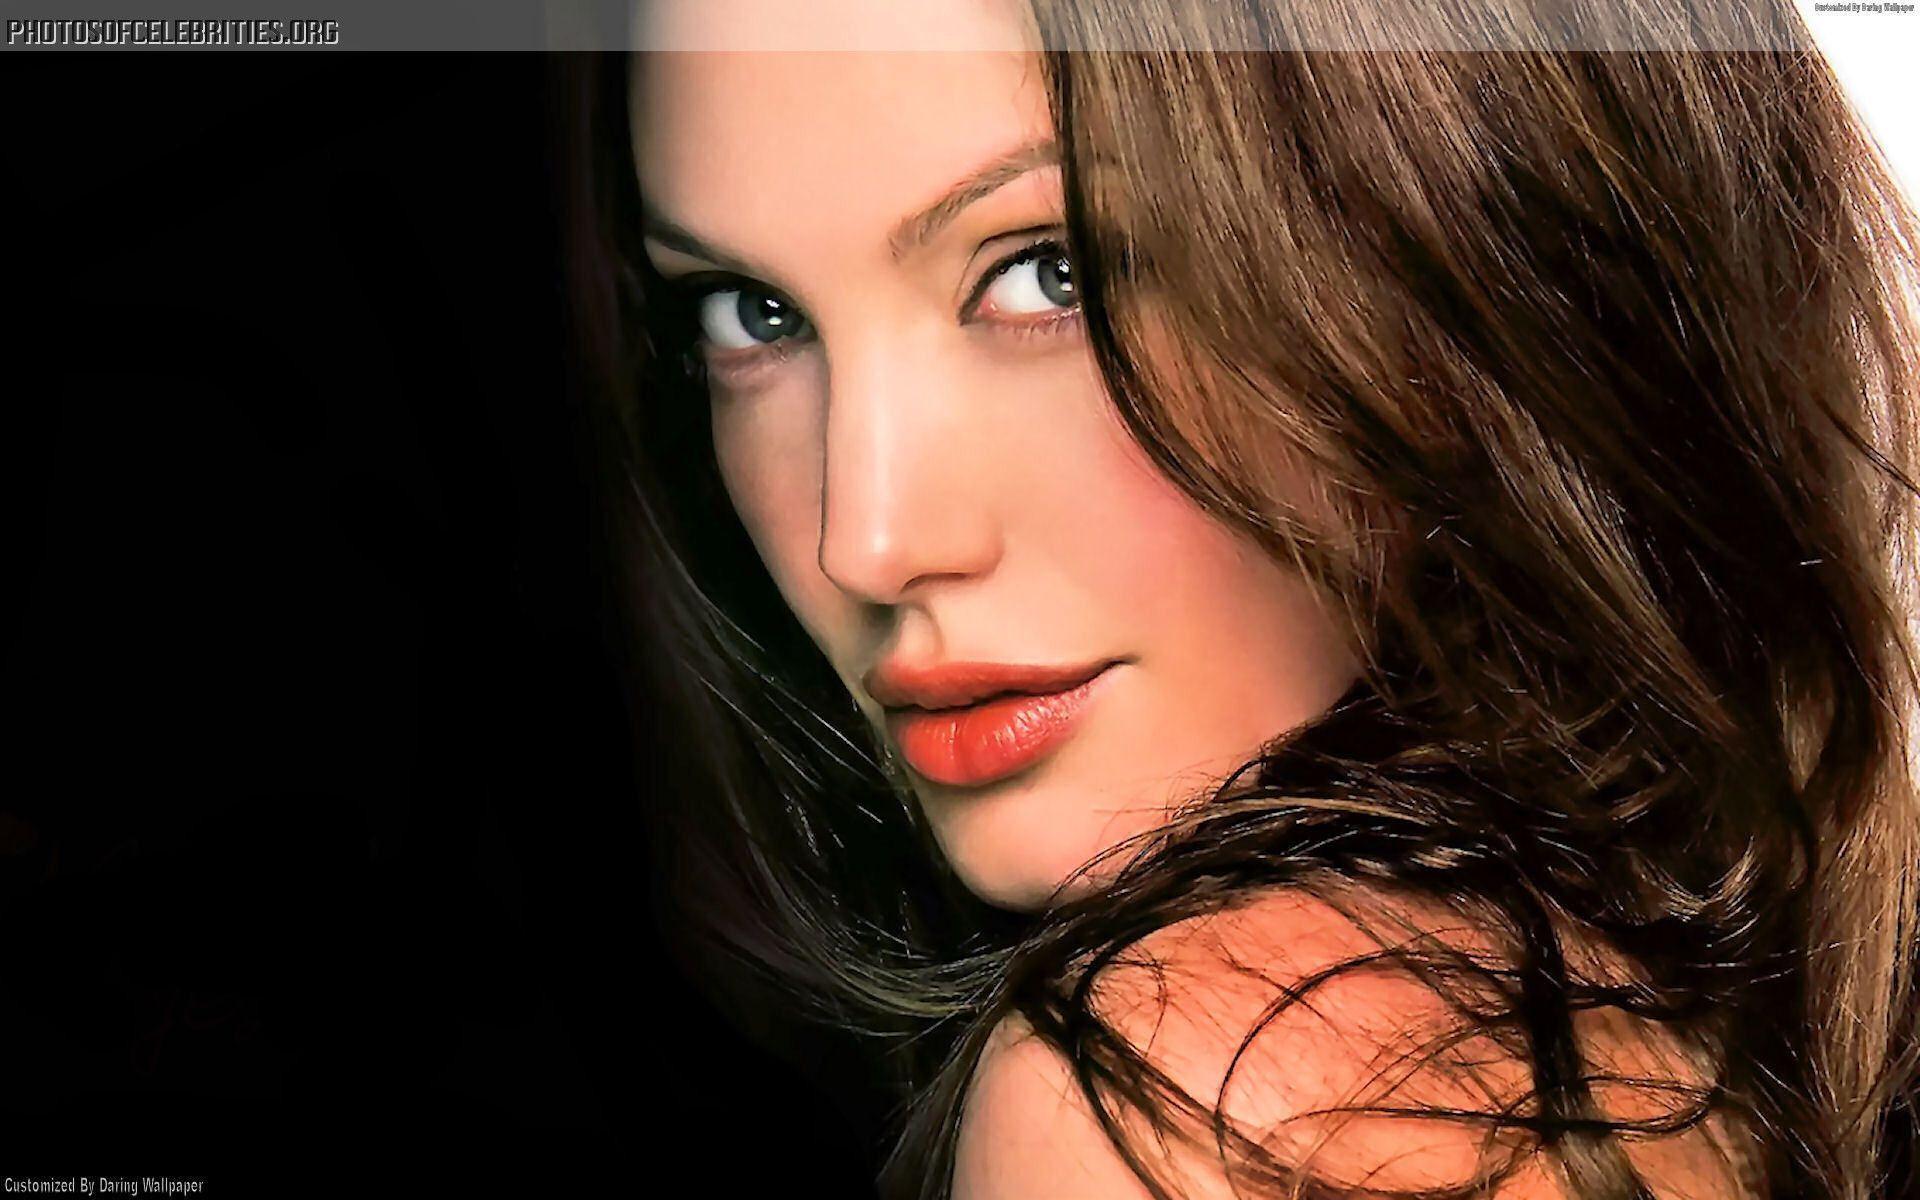 Angelina Jolie Wallpaper 1287 Full HD Desktop